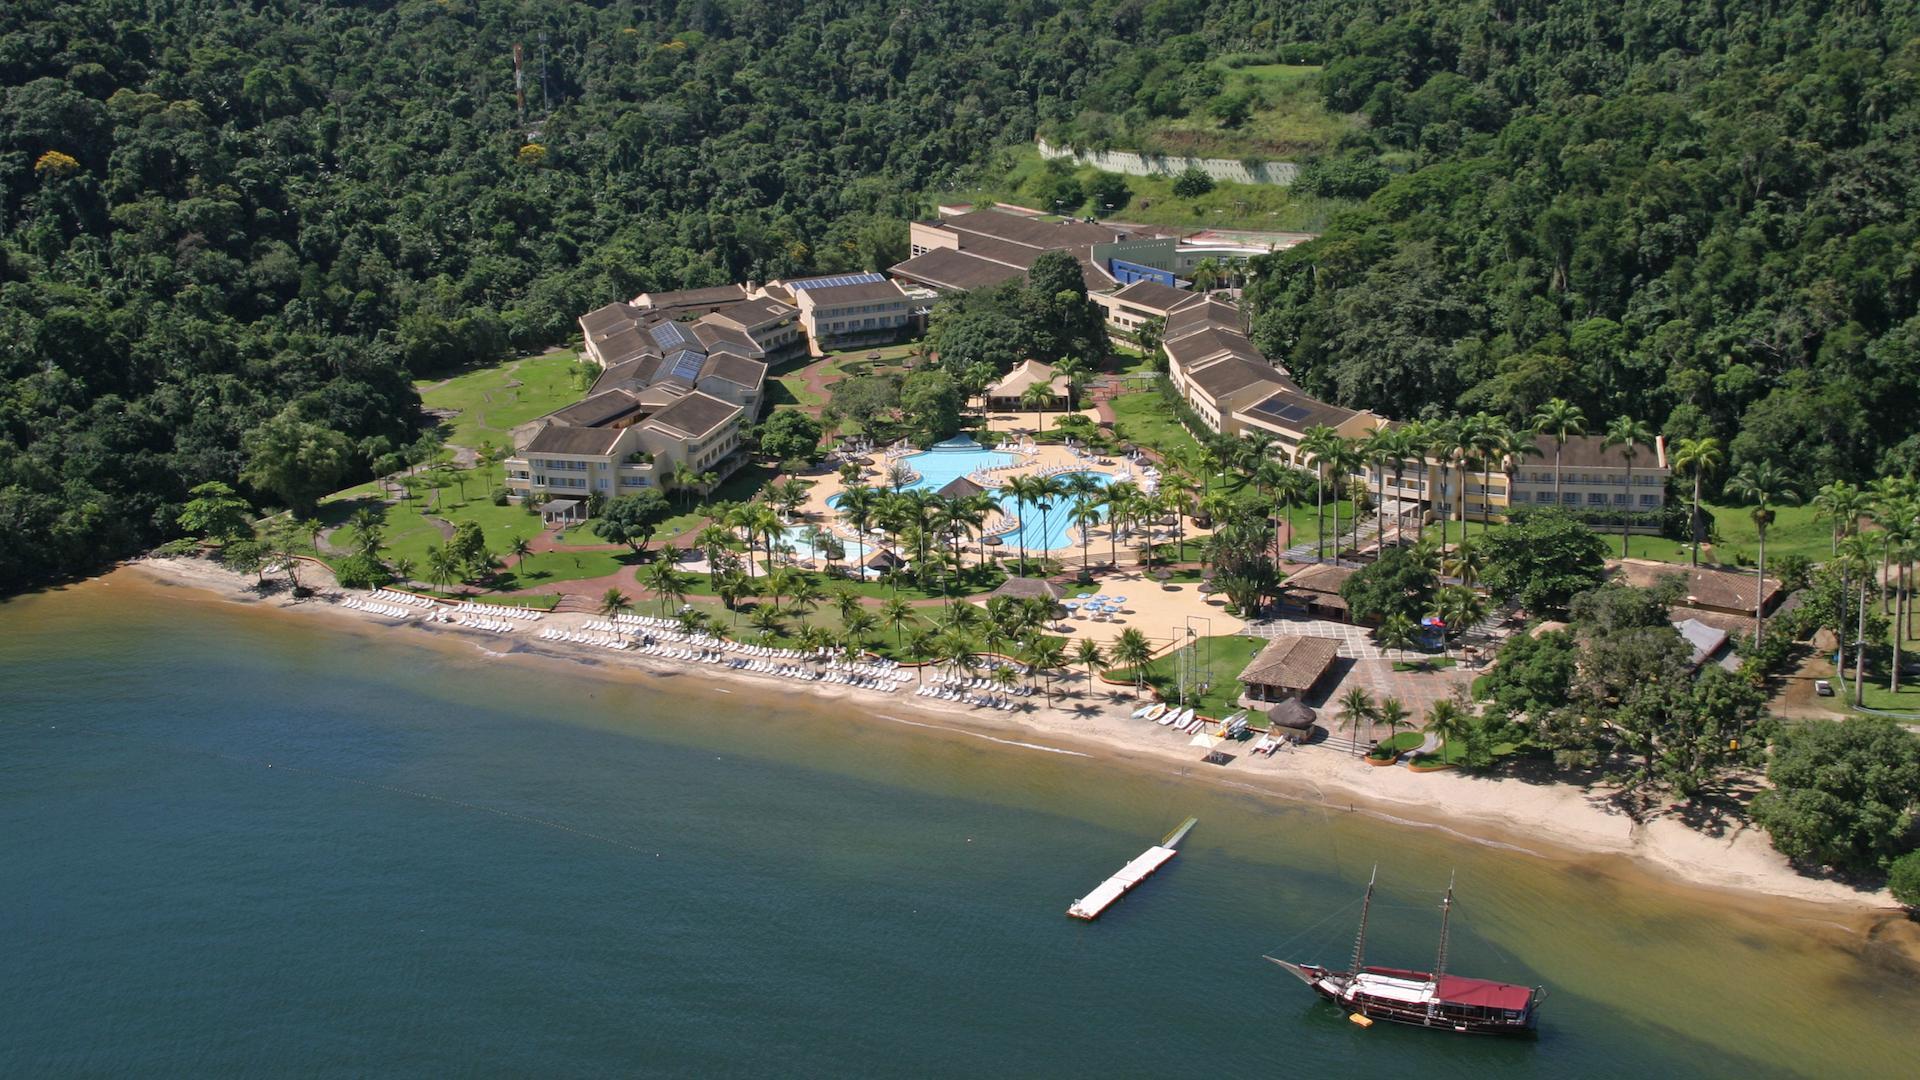 Deluxe Hotel Hotel Vila Gale Eco Resort de Angra All Inclusive Gesamtansicht